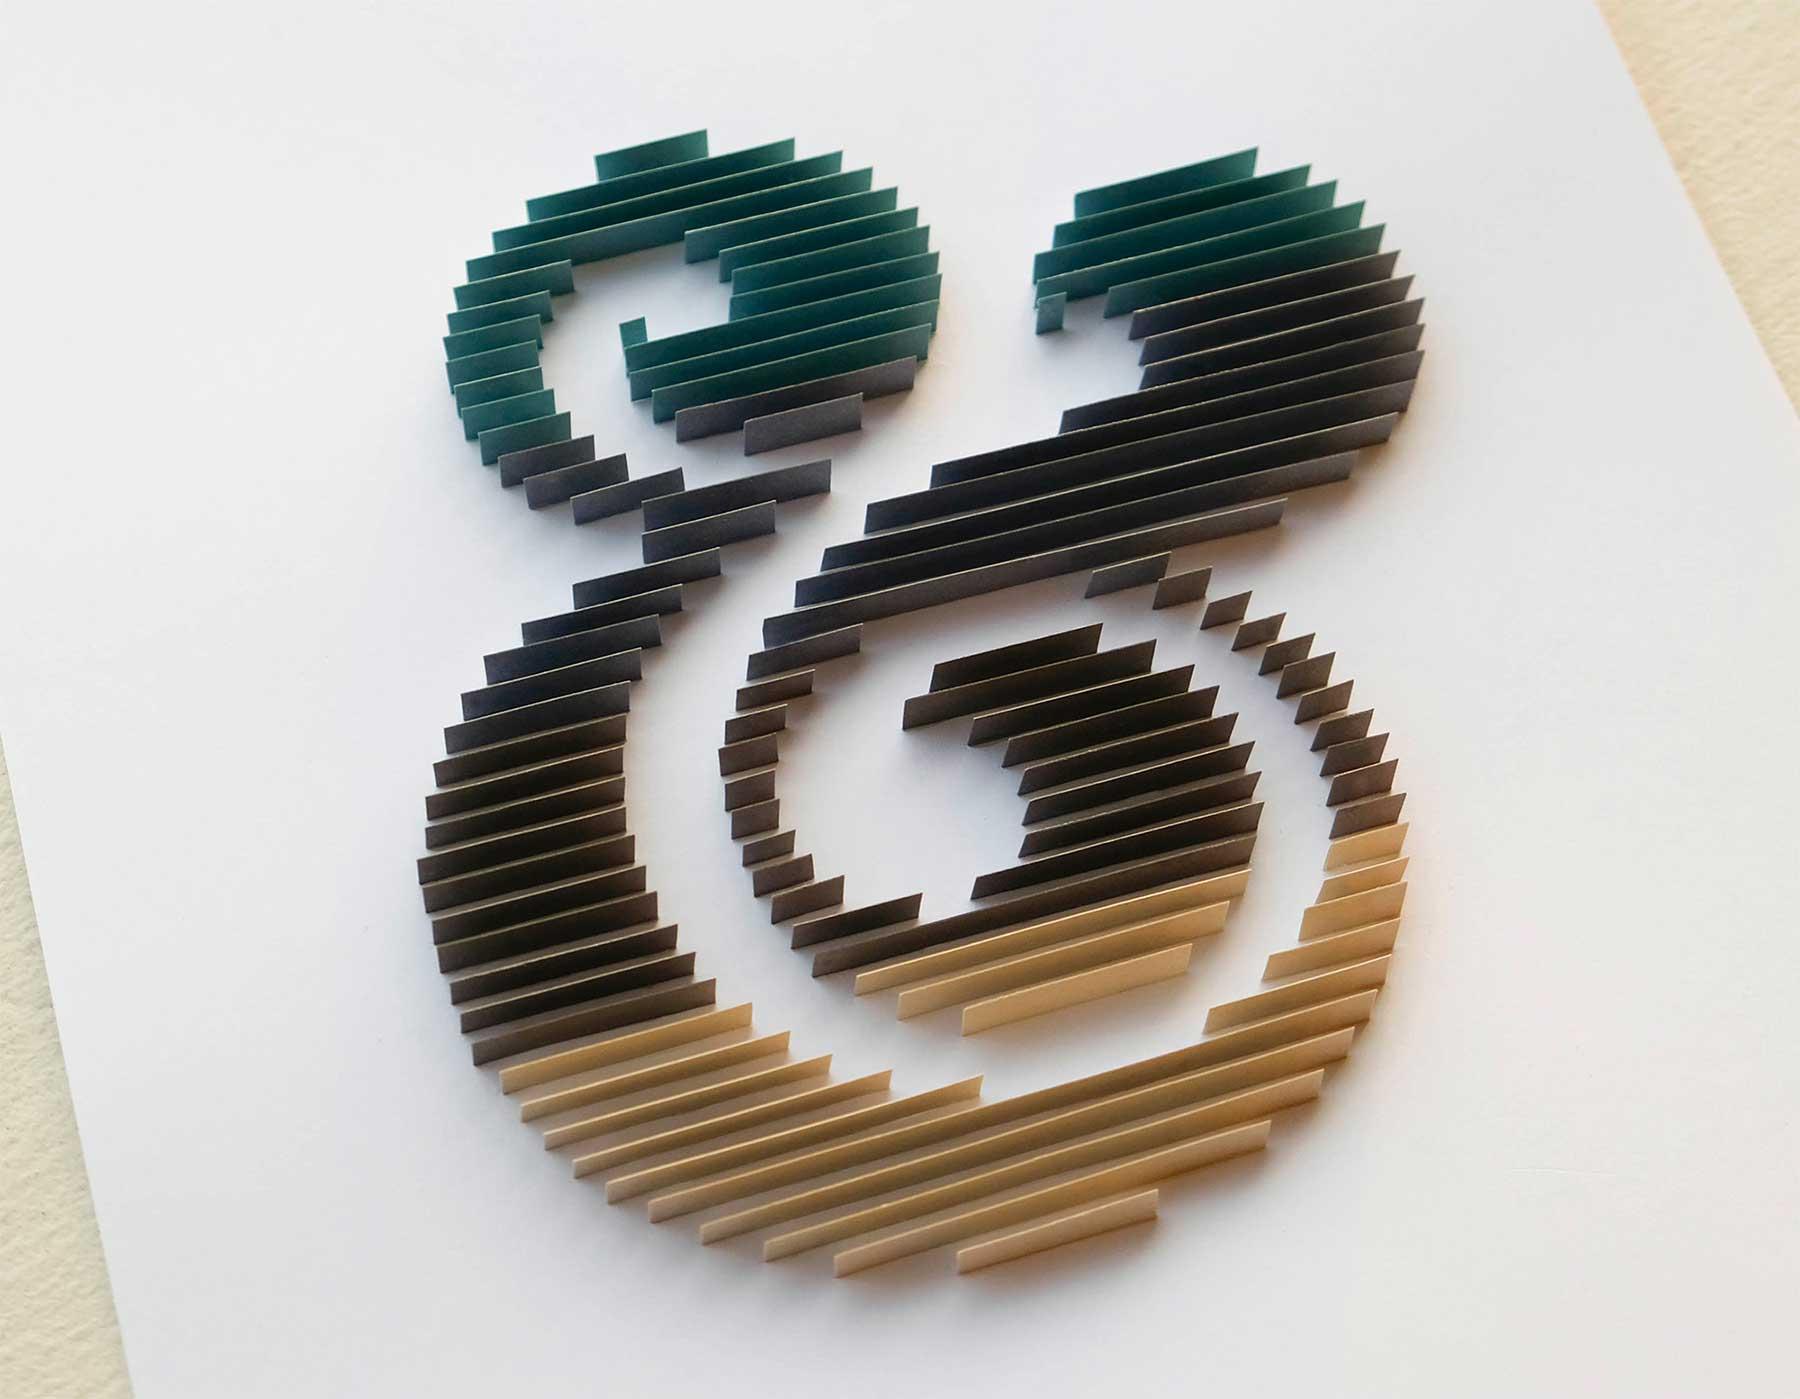 3D-Papier-Lettering von Alia Bright Alia-Bright-paperlettering_06